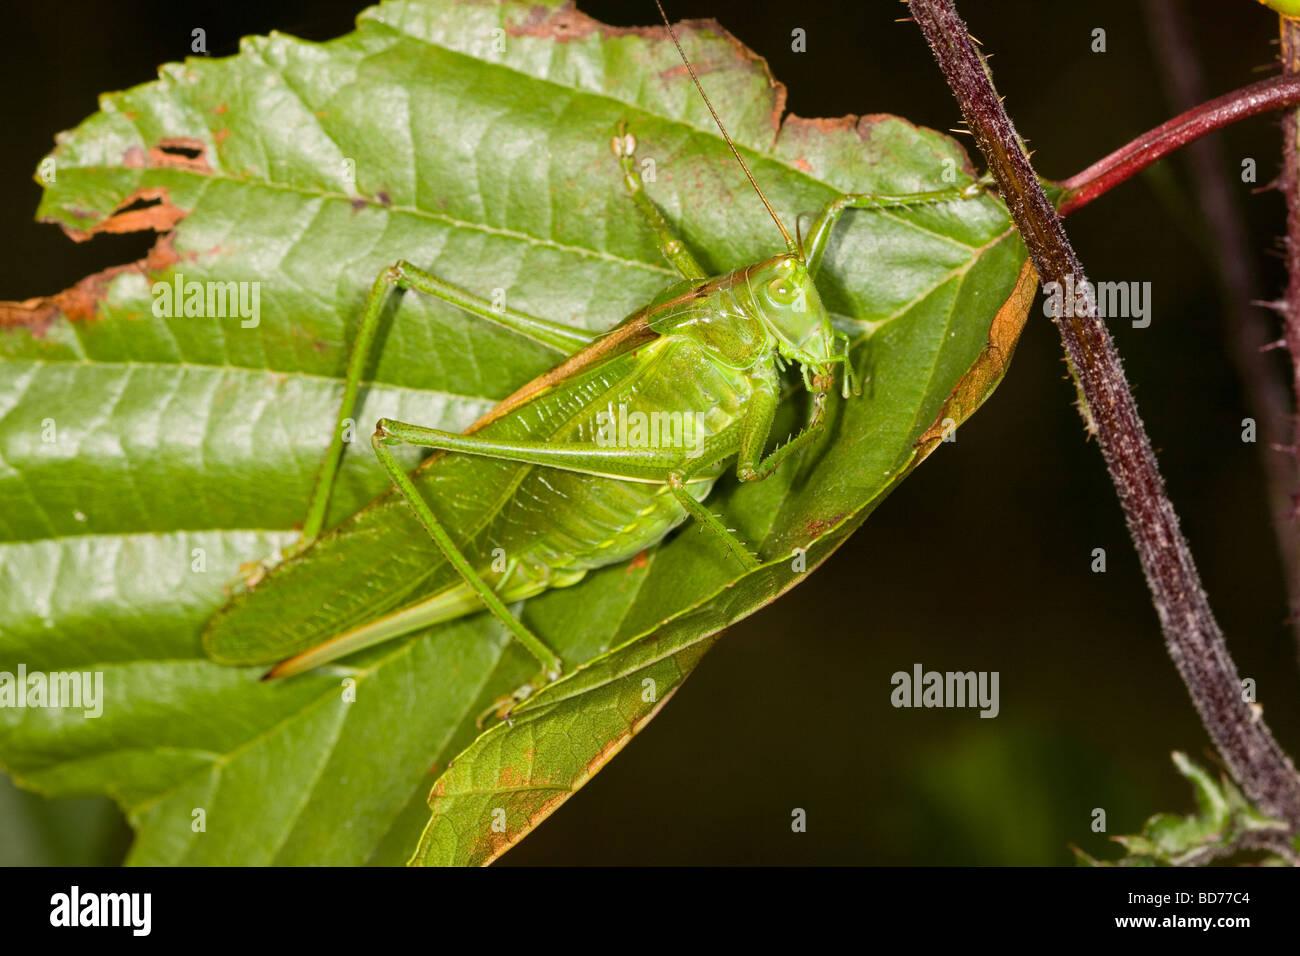 Tettigoniidae auf einem grünen Blatt Stockbild